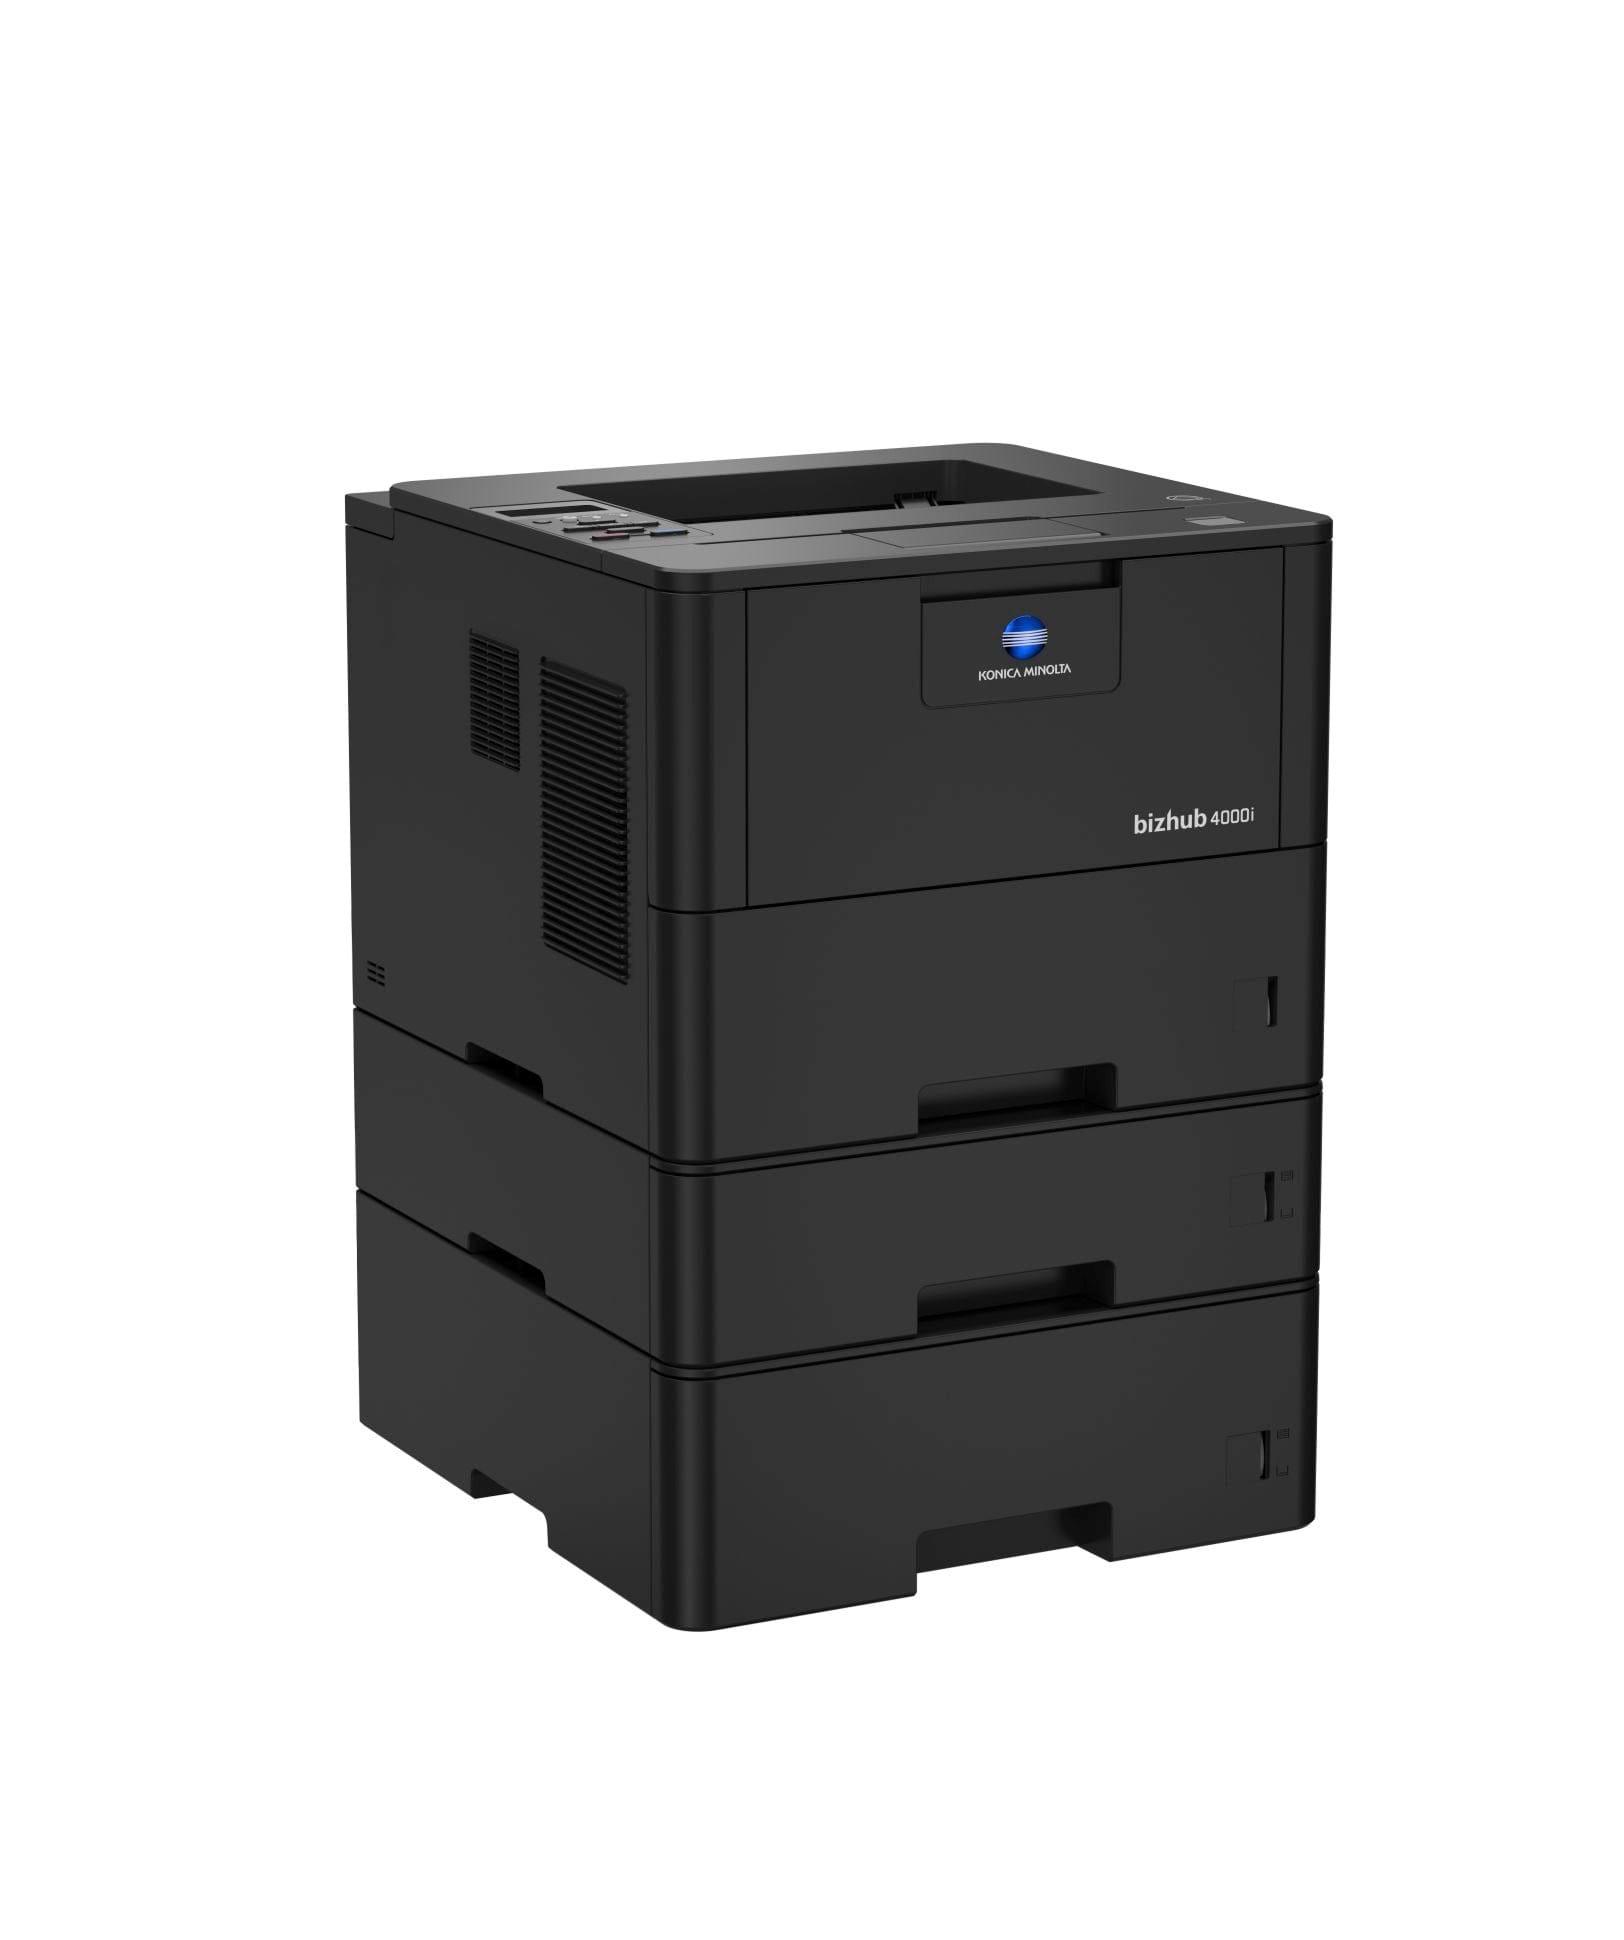 bizhub 4000i | Multifunctionele printer | KONICA MINOLTA